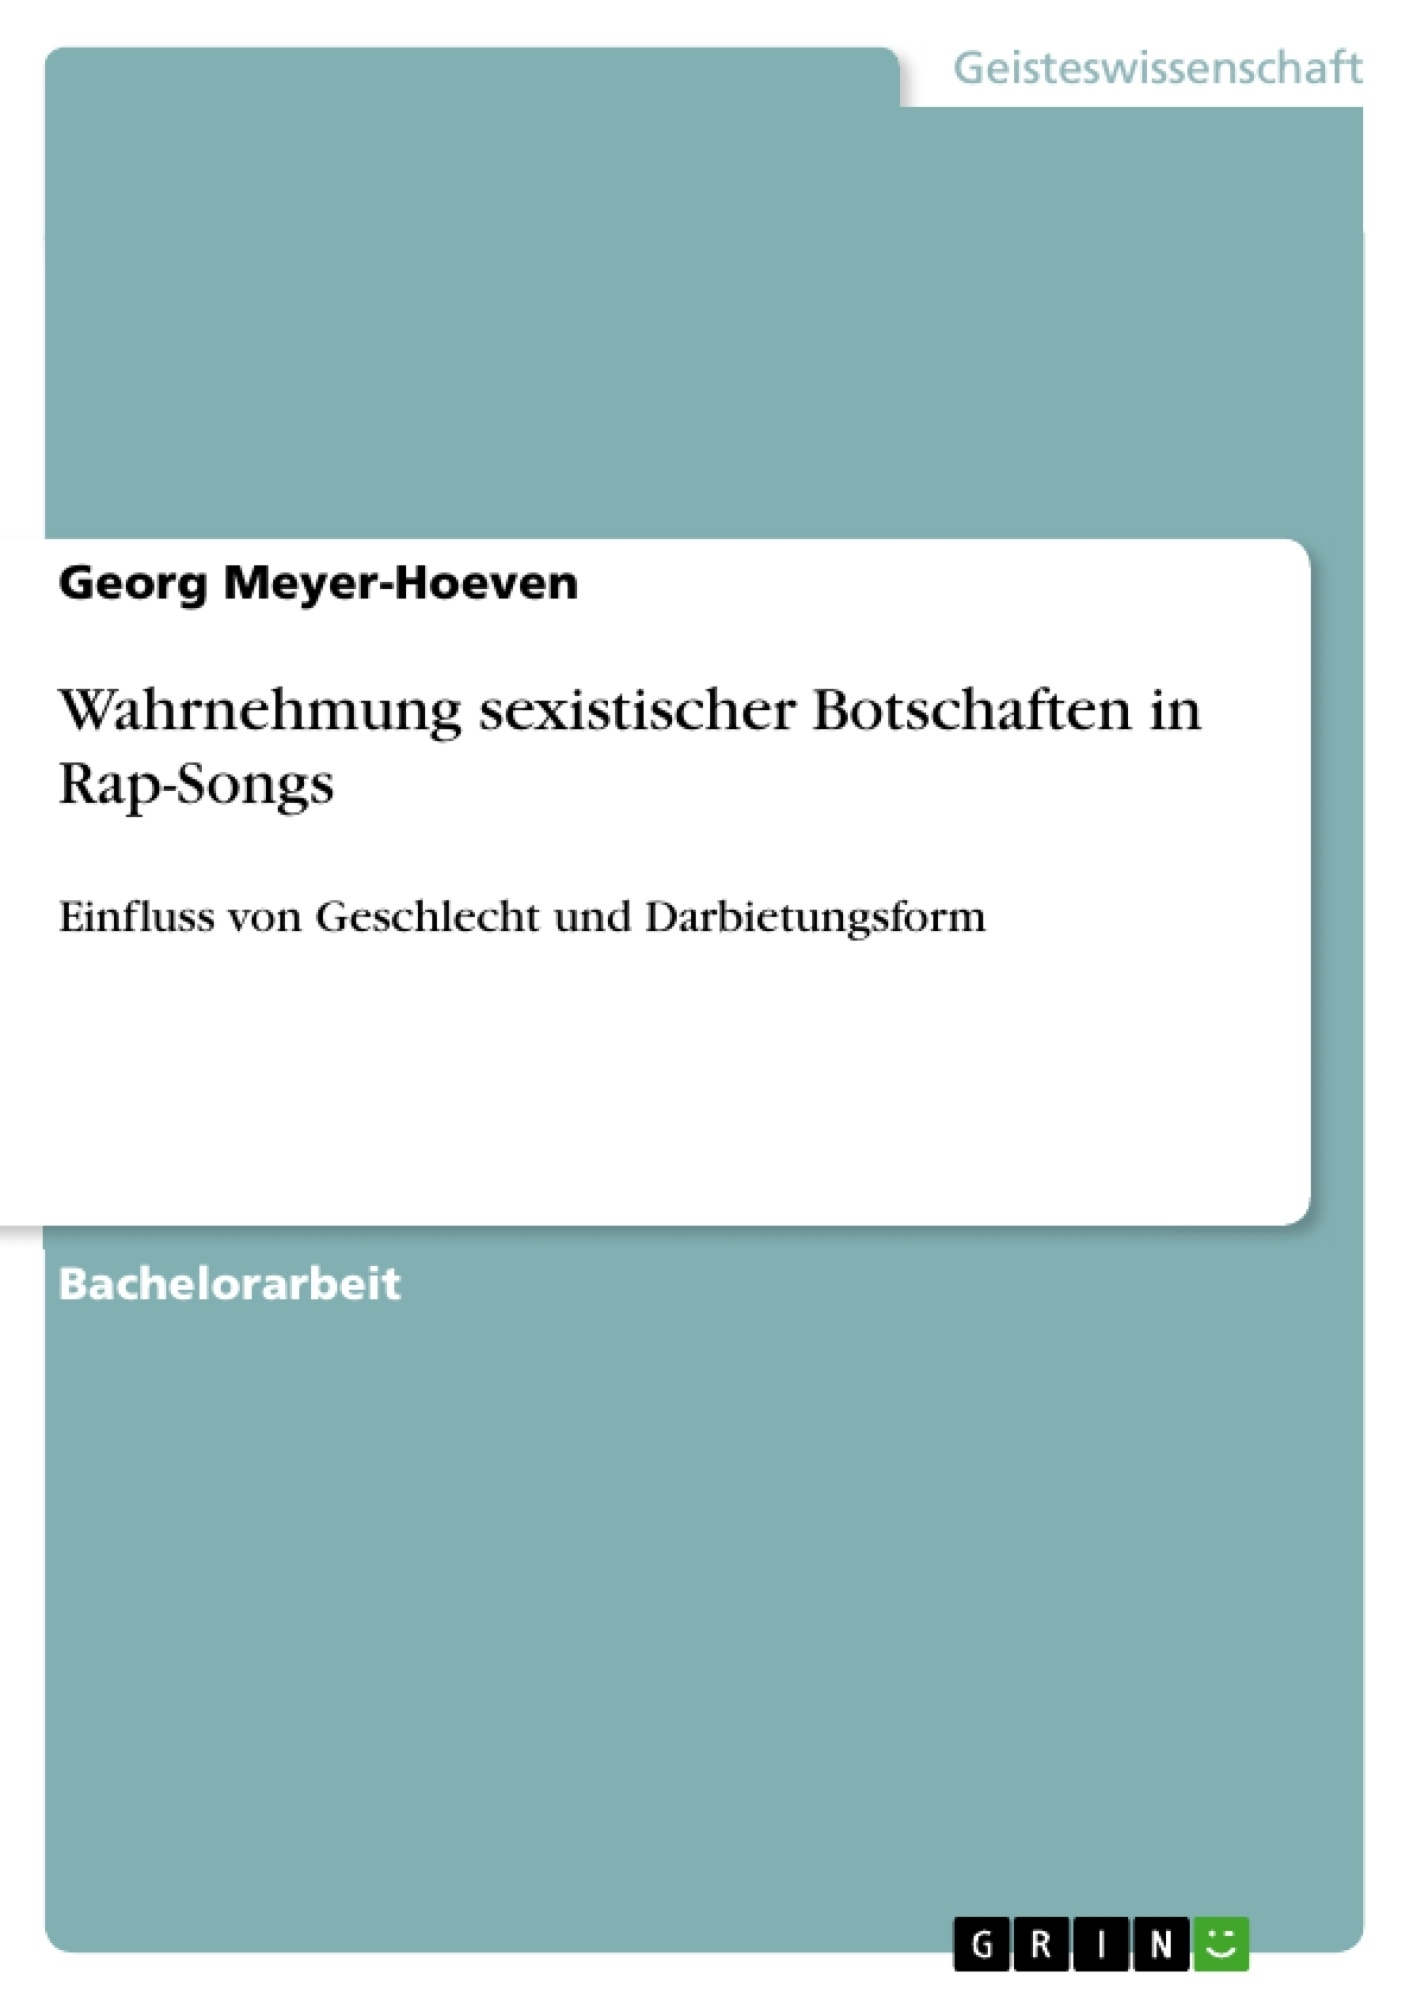 Titel: Wahrnehmung sexistischer Botschaften in Rap-Songs